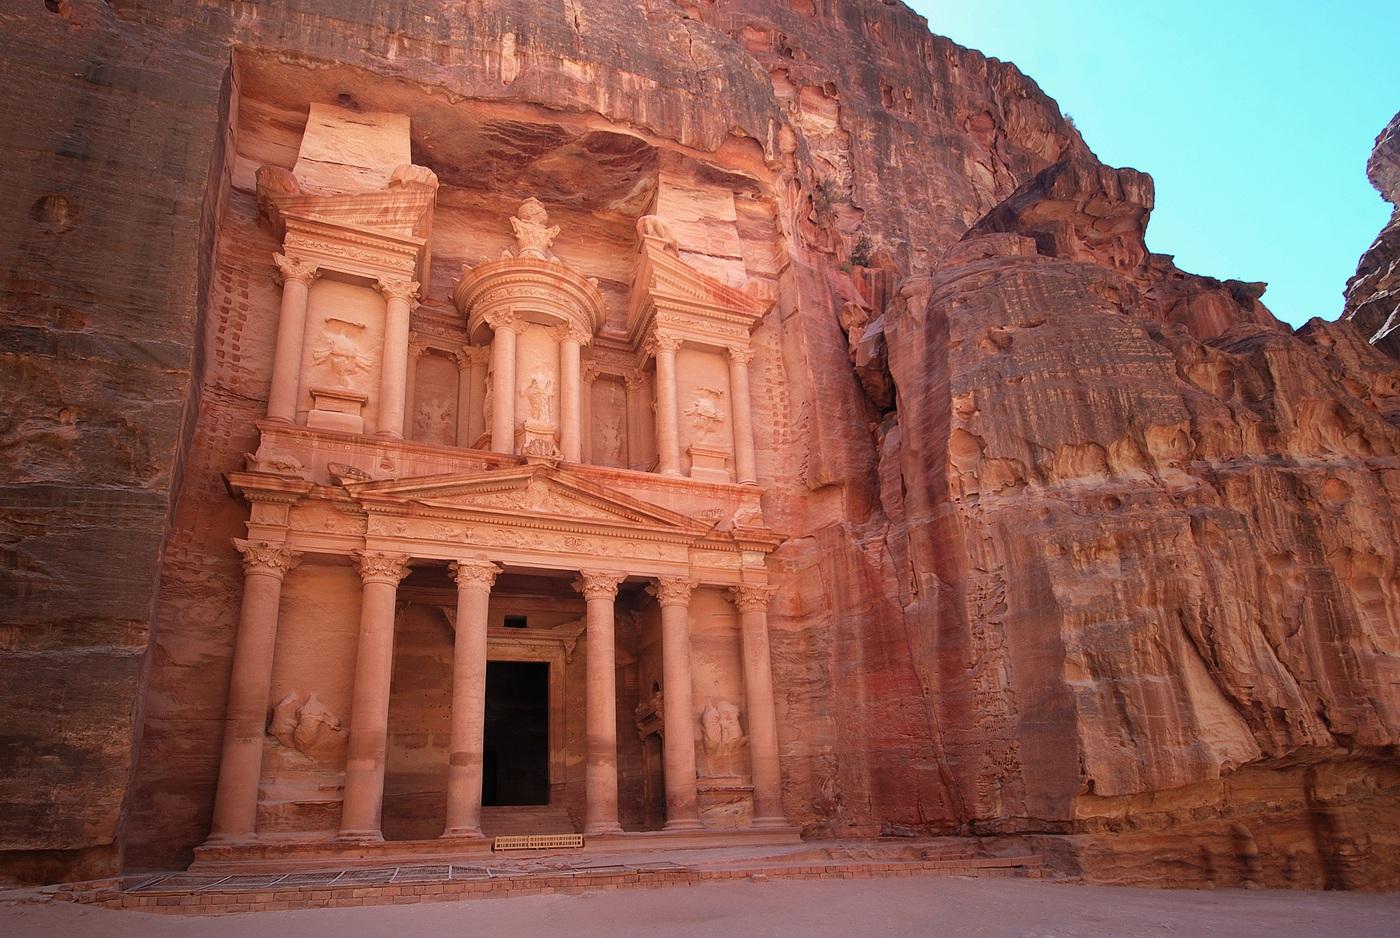 Jordan's Lost city